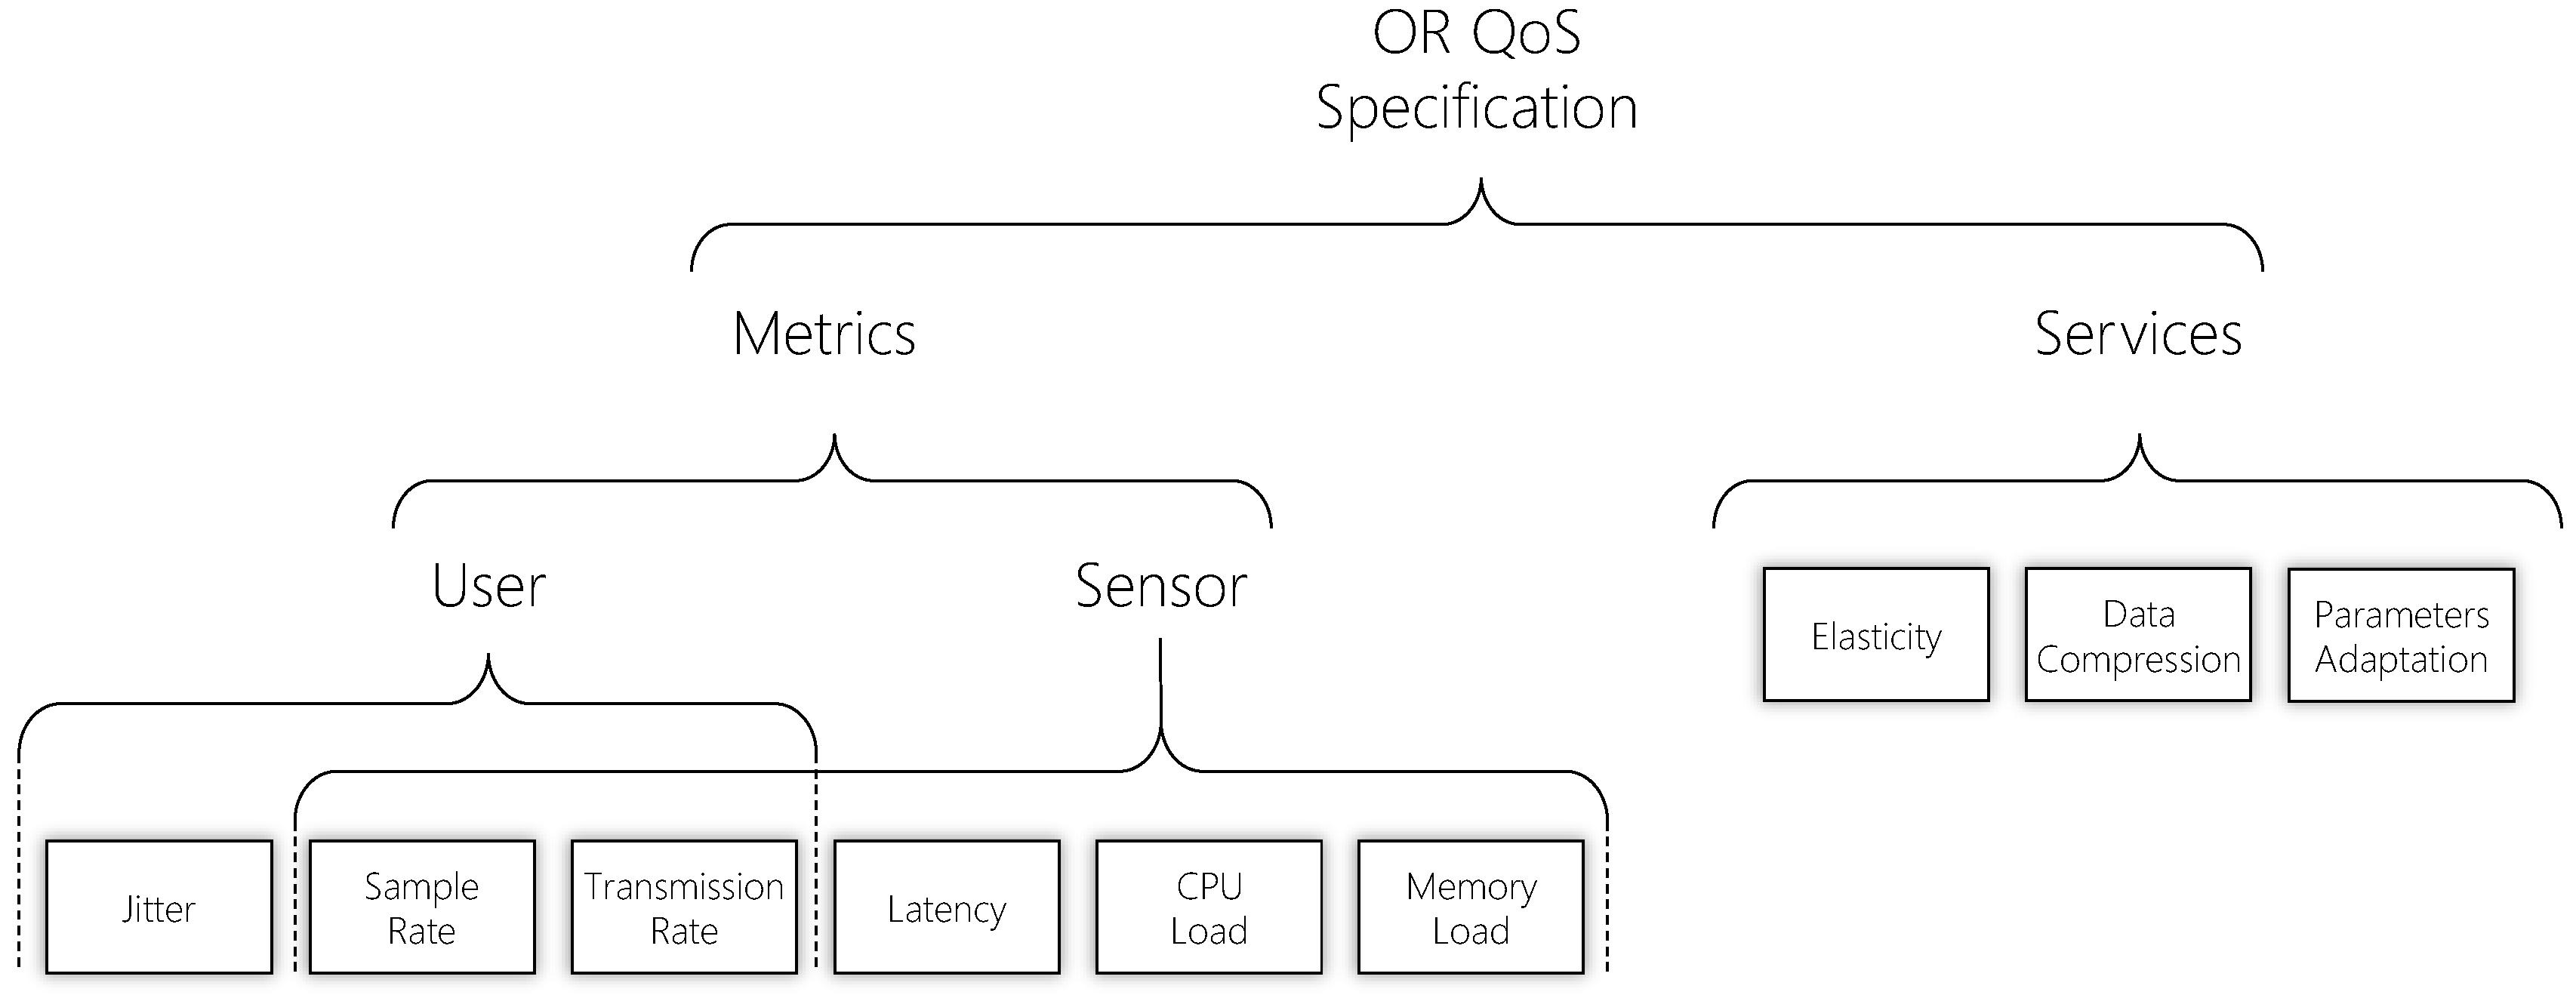 Sensors | Free Full-Text | On Providing Multi-Level Quality of ... on